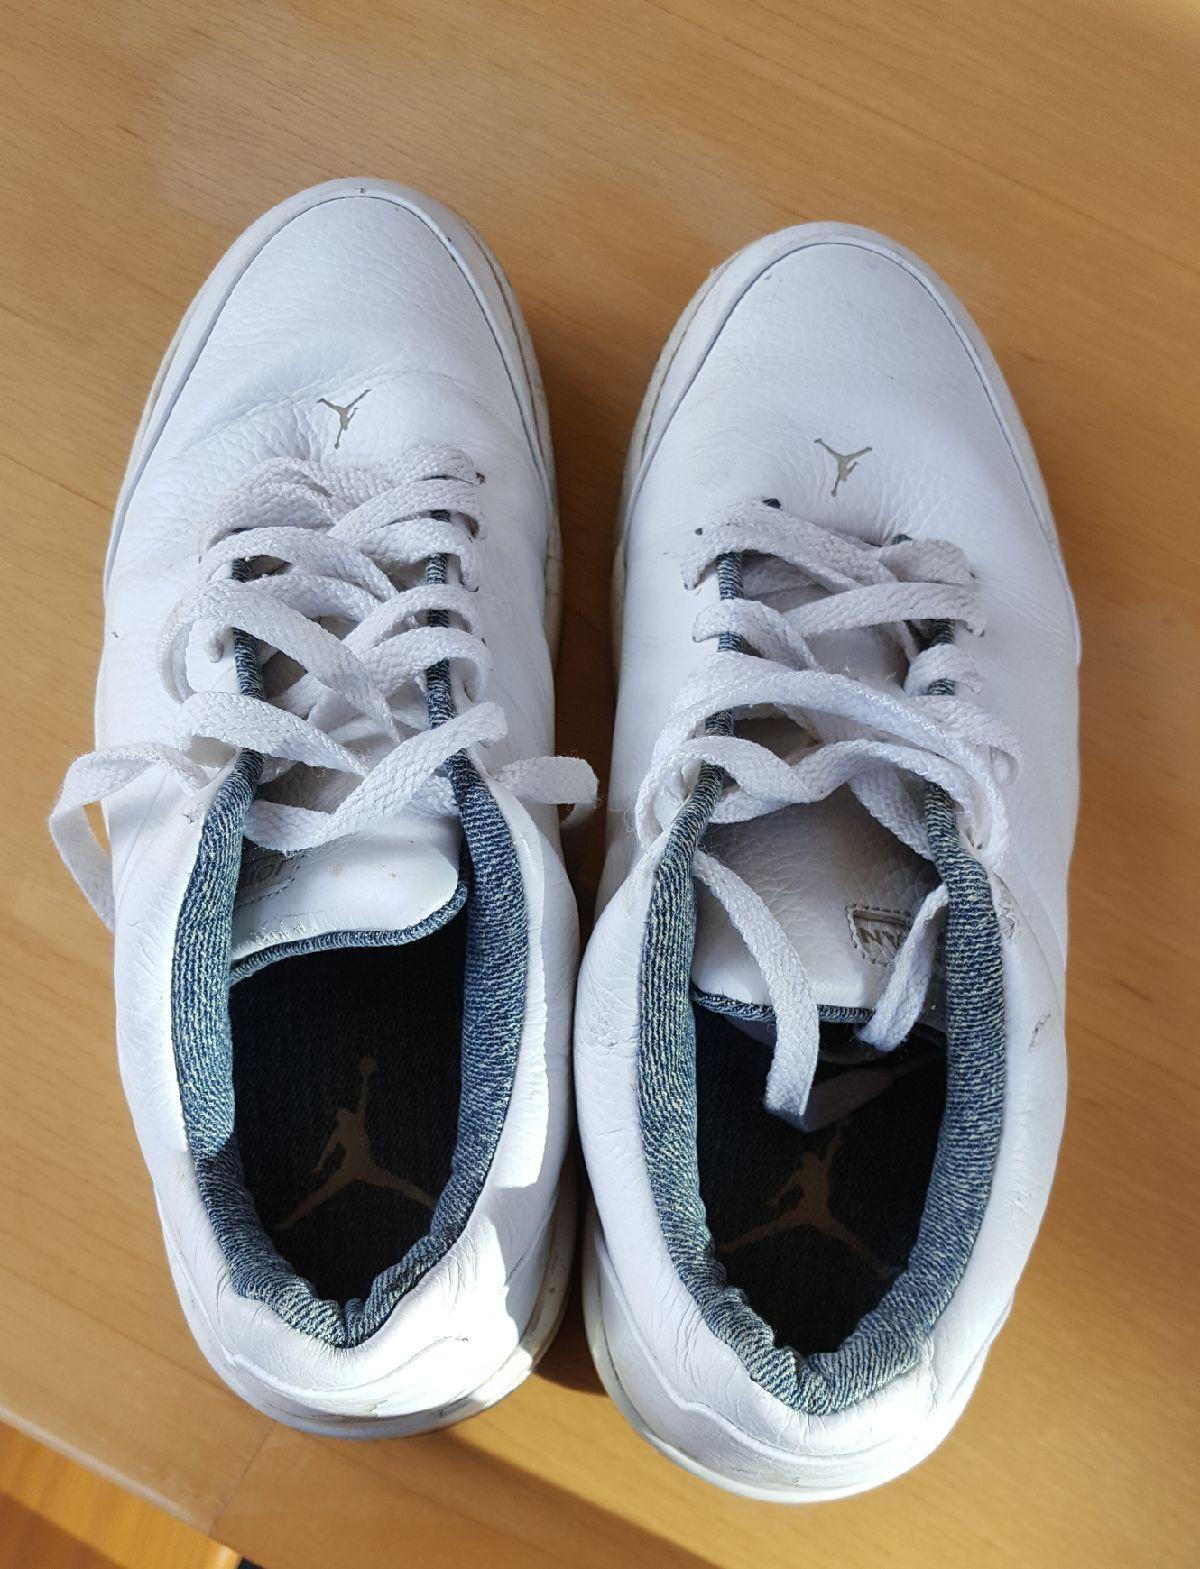 25a8aef1e6e1b1 2006 Mens N ke Air Jordan 23 Classic White Leather Shoes Size 8.5 313480-